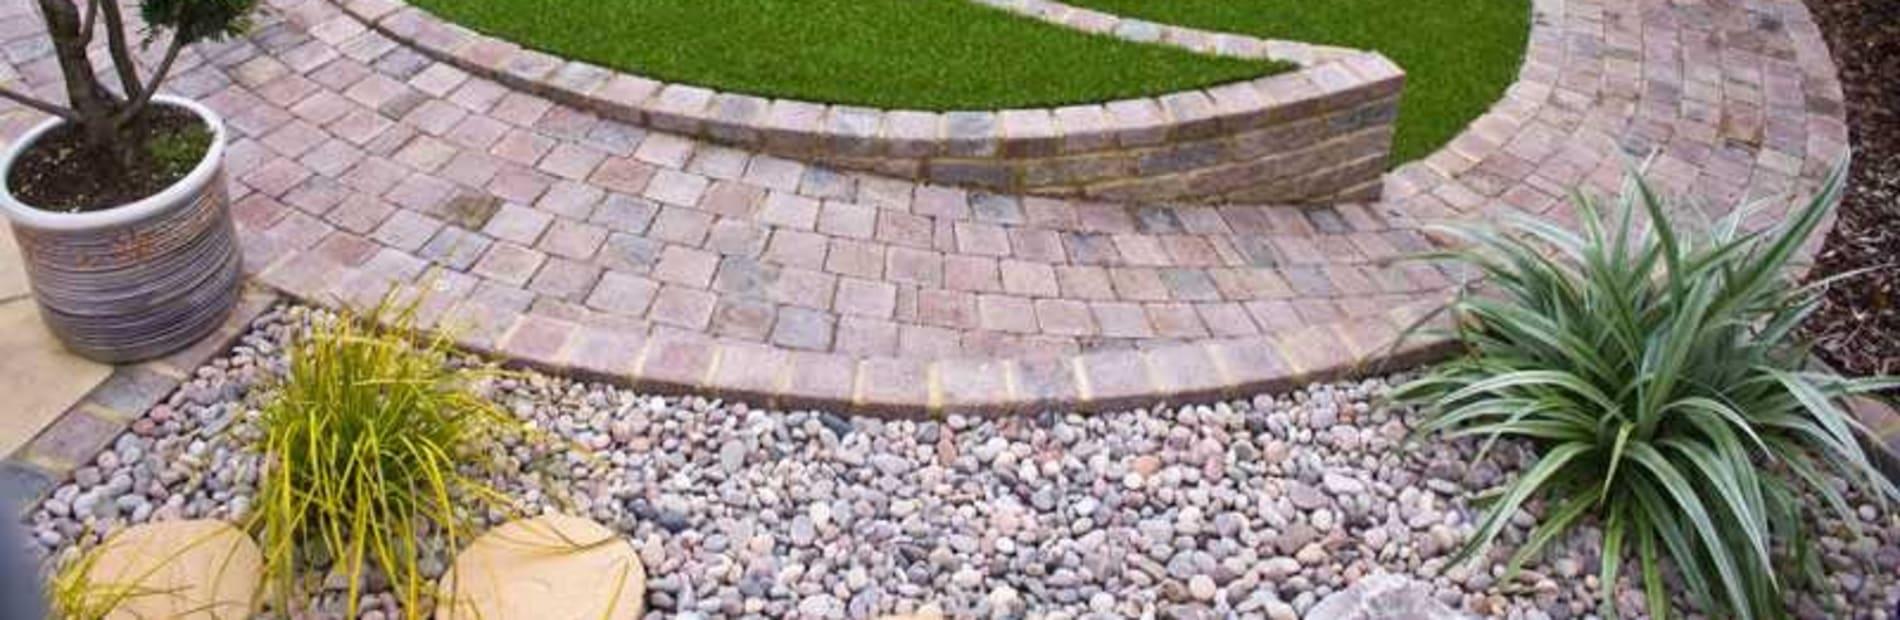 aggregates used in a patio area